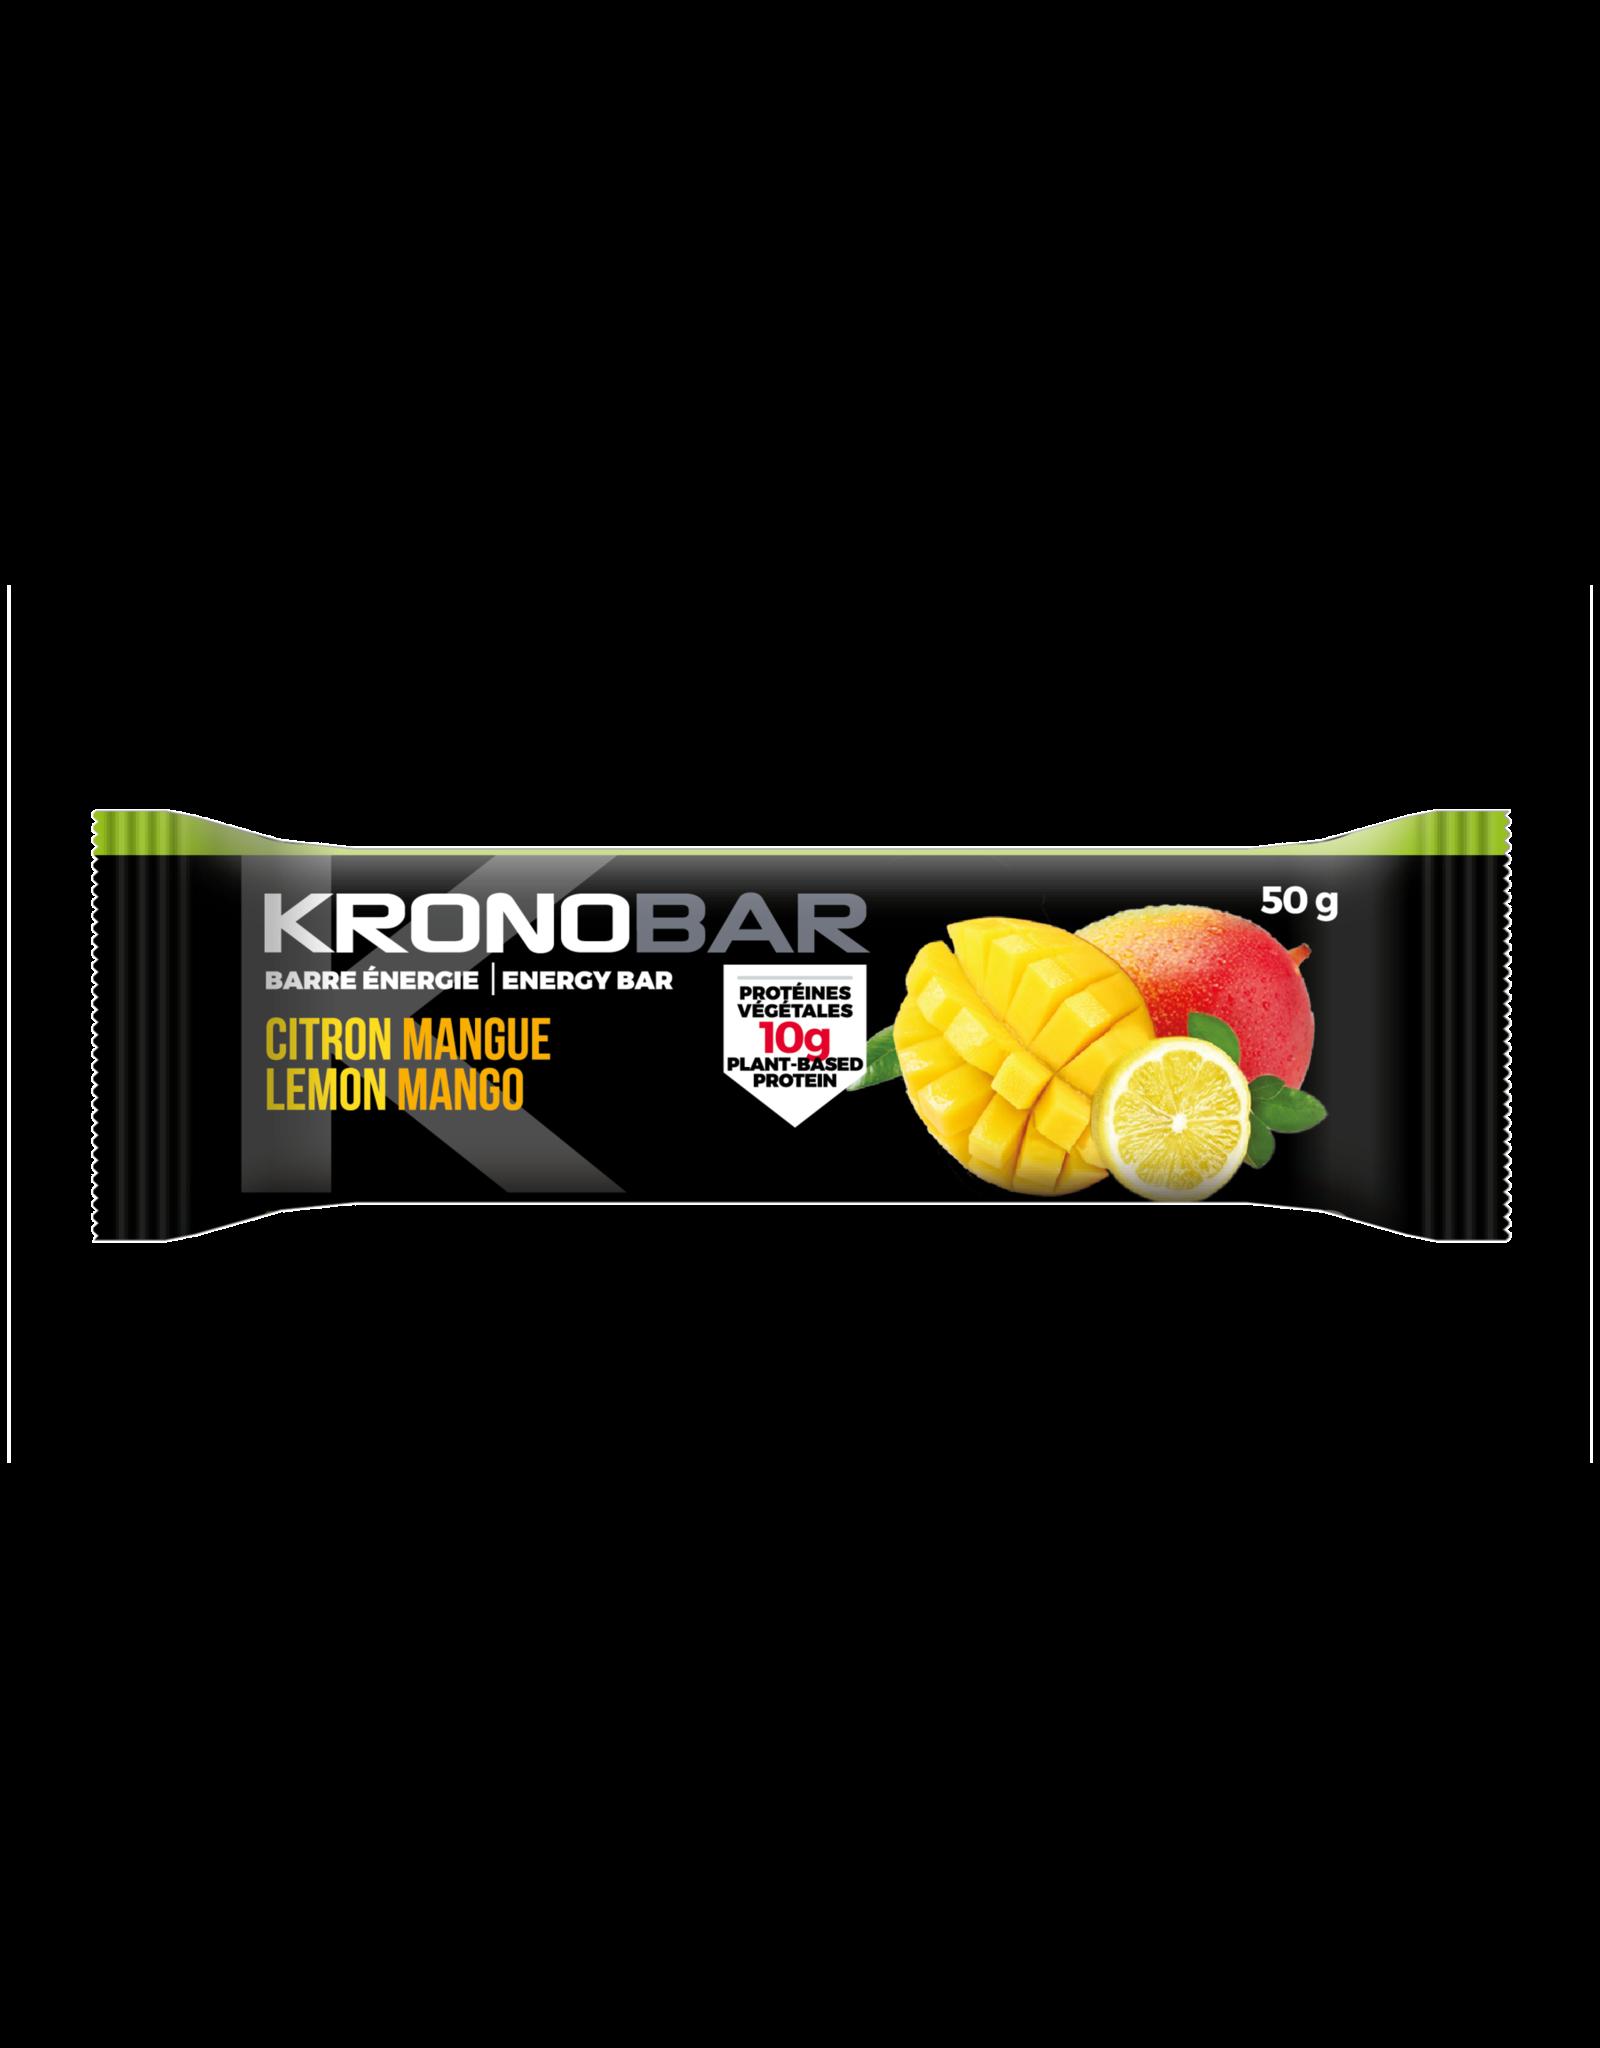 Kronobar Kronobar endurance 10g protein (50g)